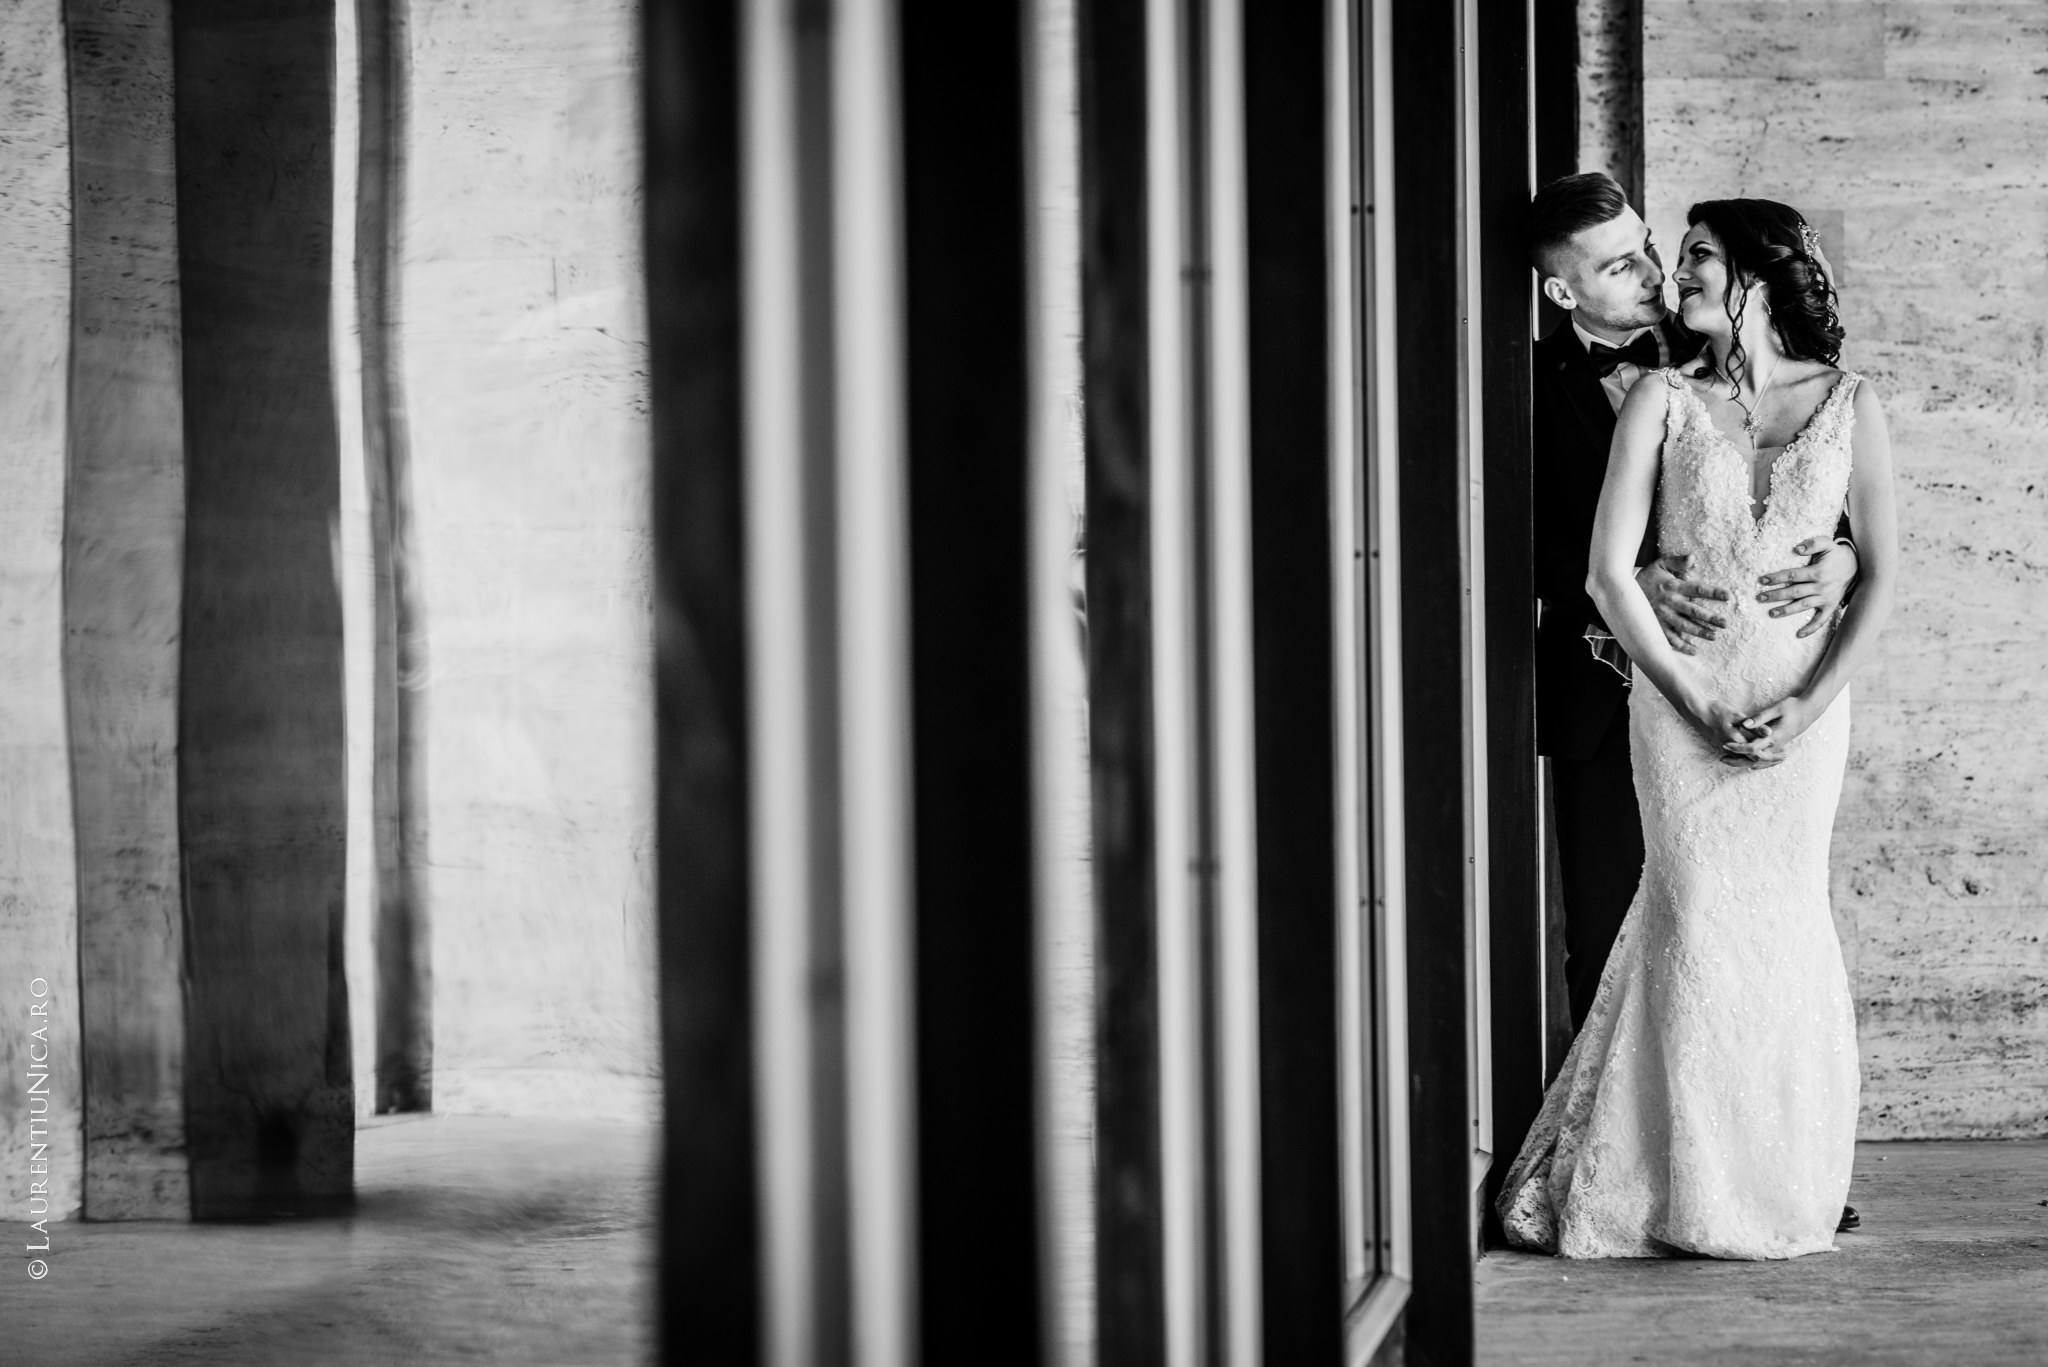 fotografii nunta craiova bia alex fotograf nunta laurentiu nica 32 - Bia & Alex | Fotografii nunta | Craiova